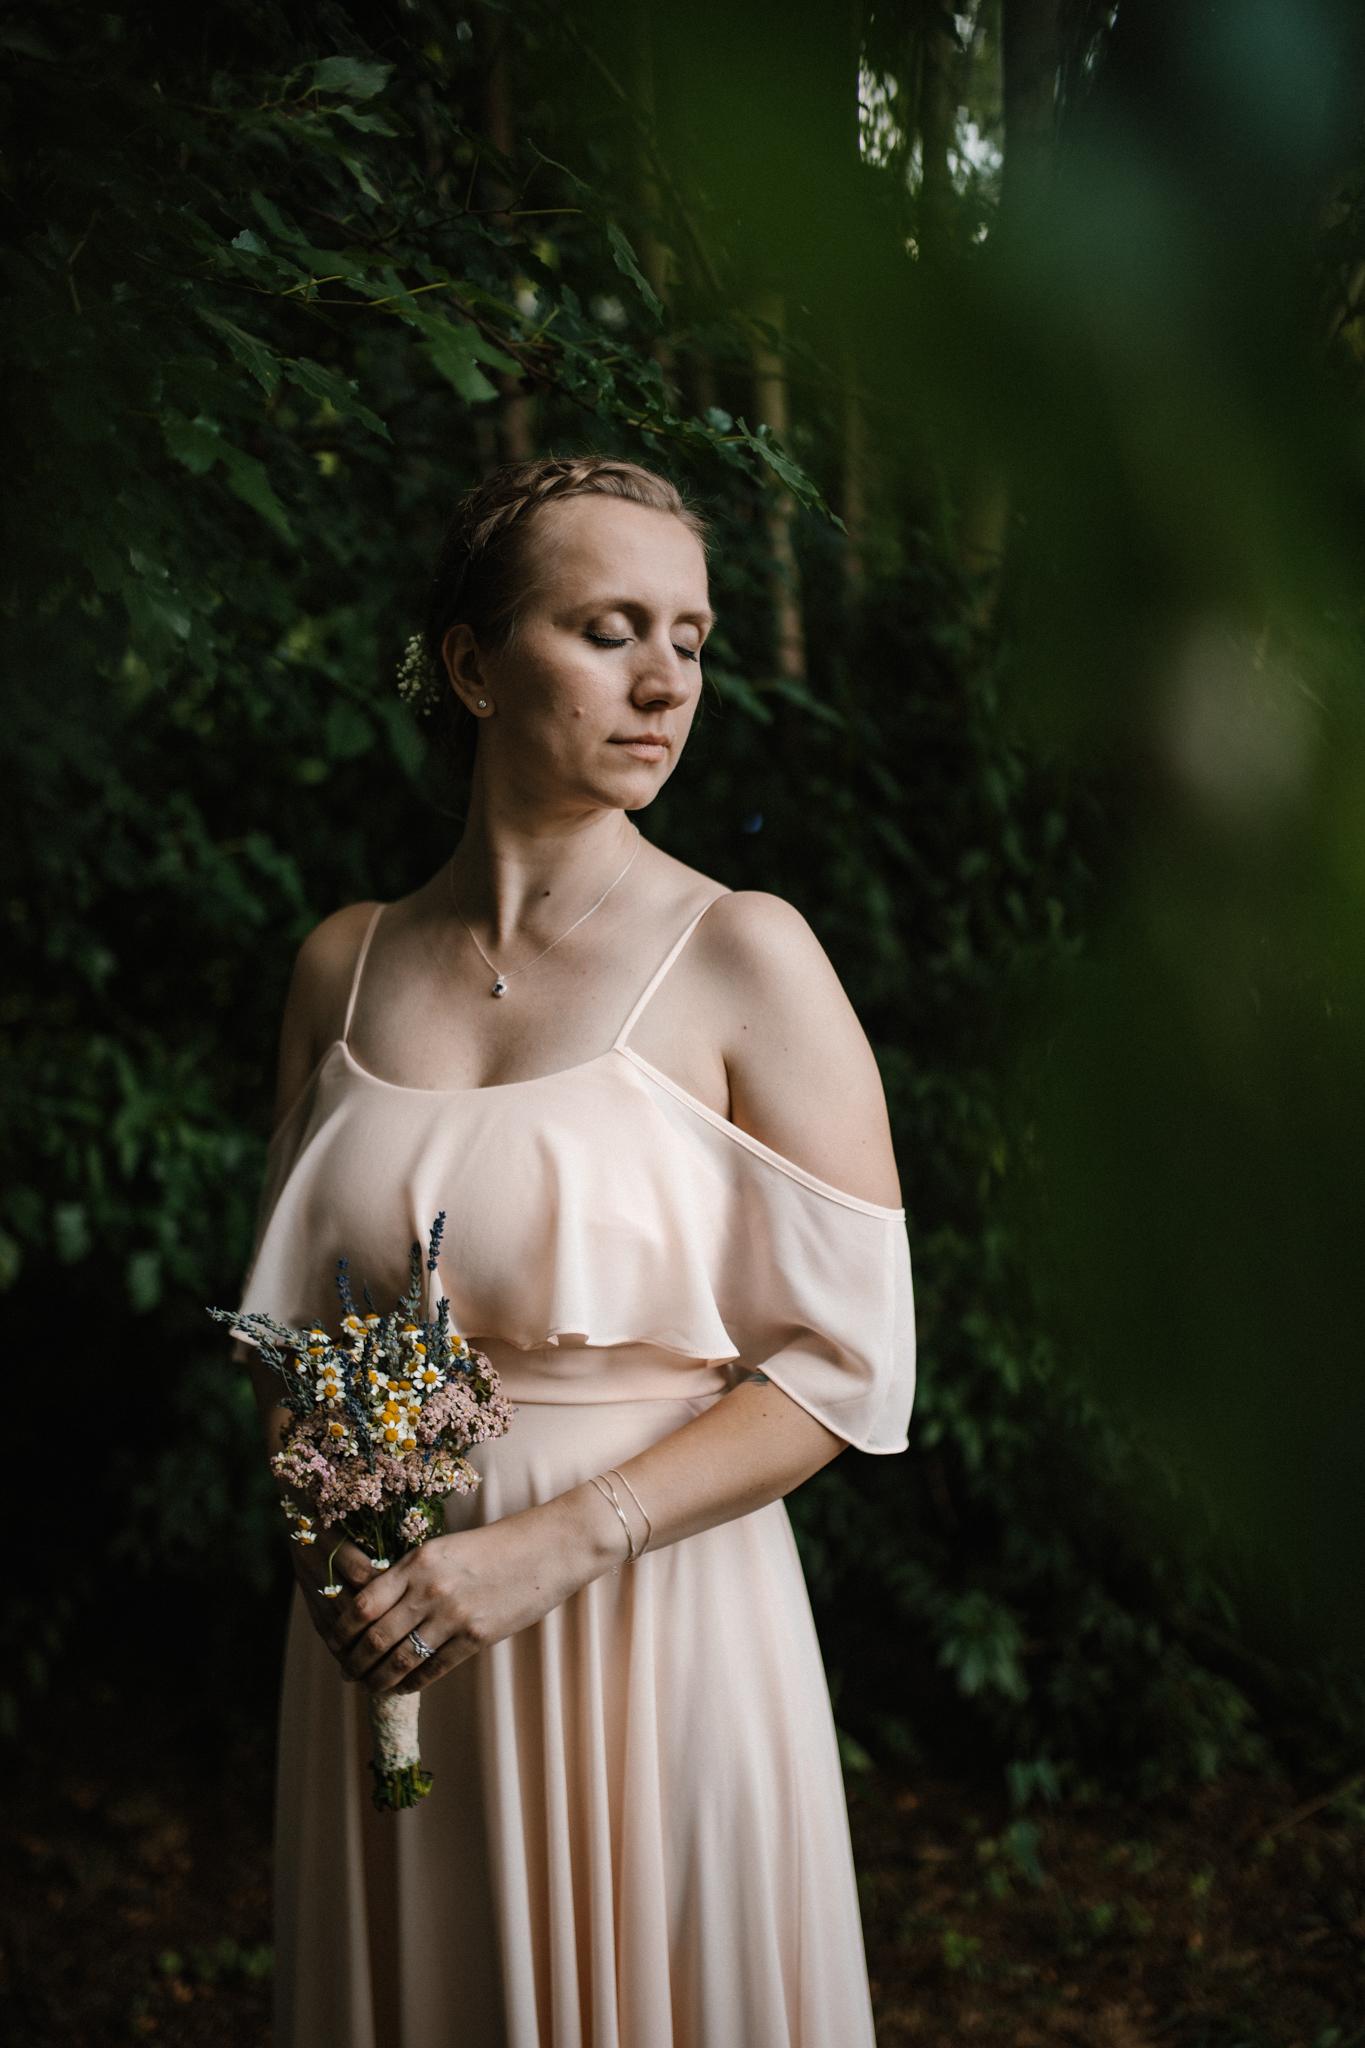 dorota_dwight_richmond_backyard_wedding-56.jpg